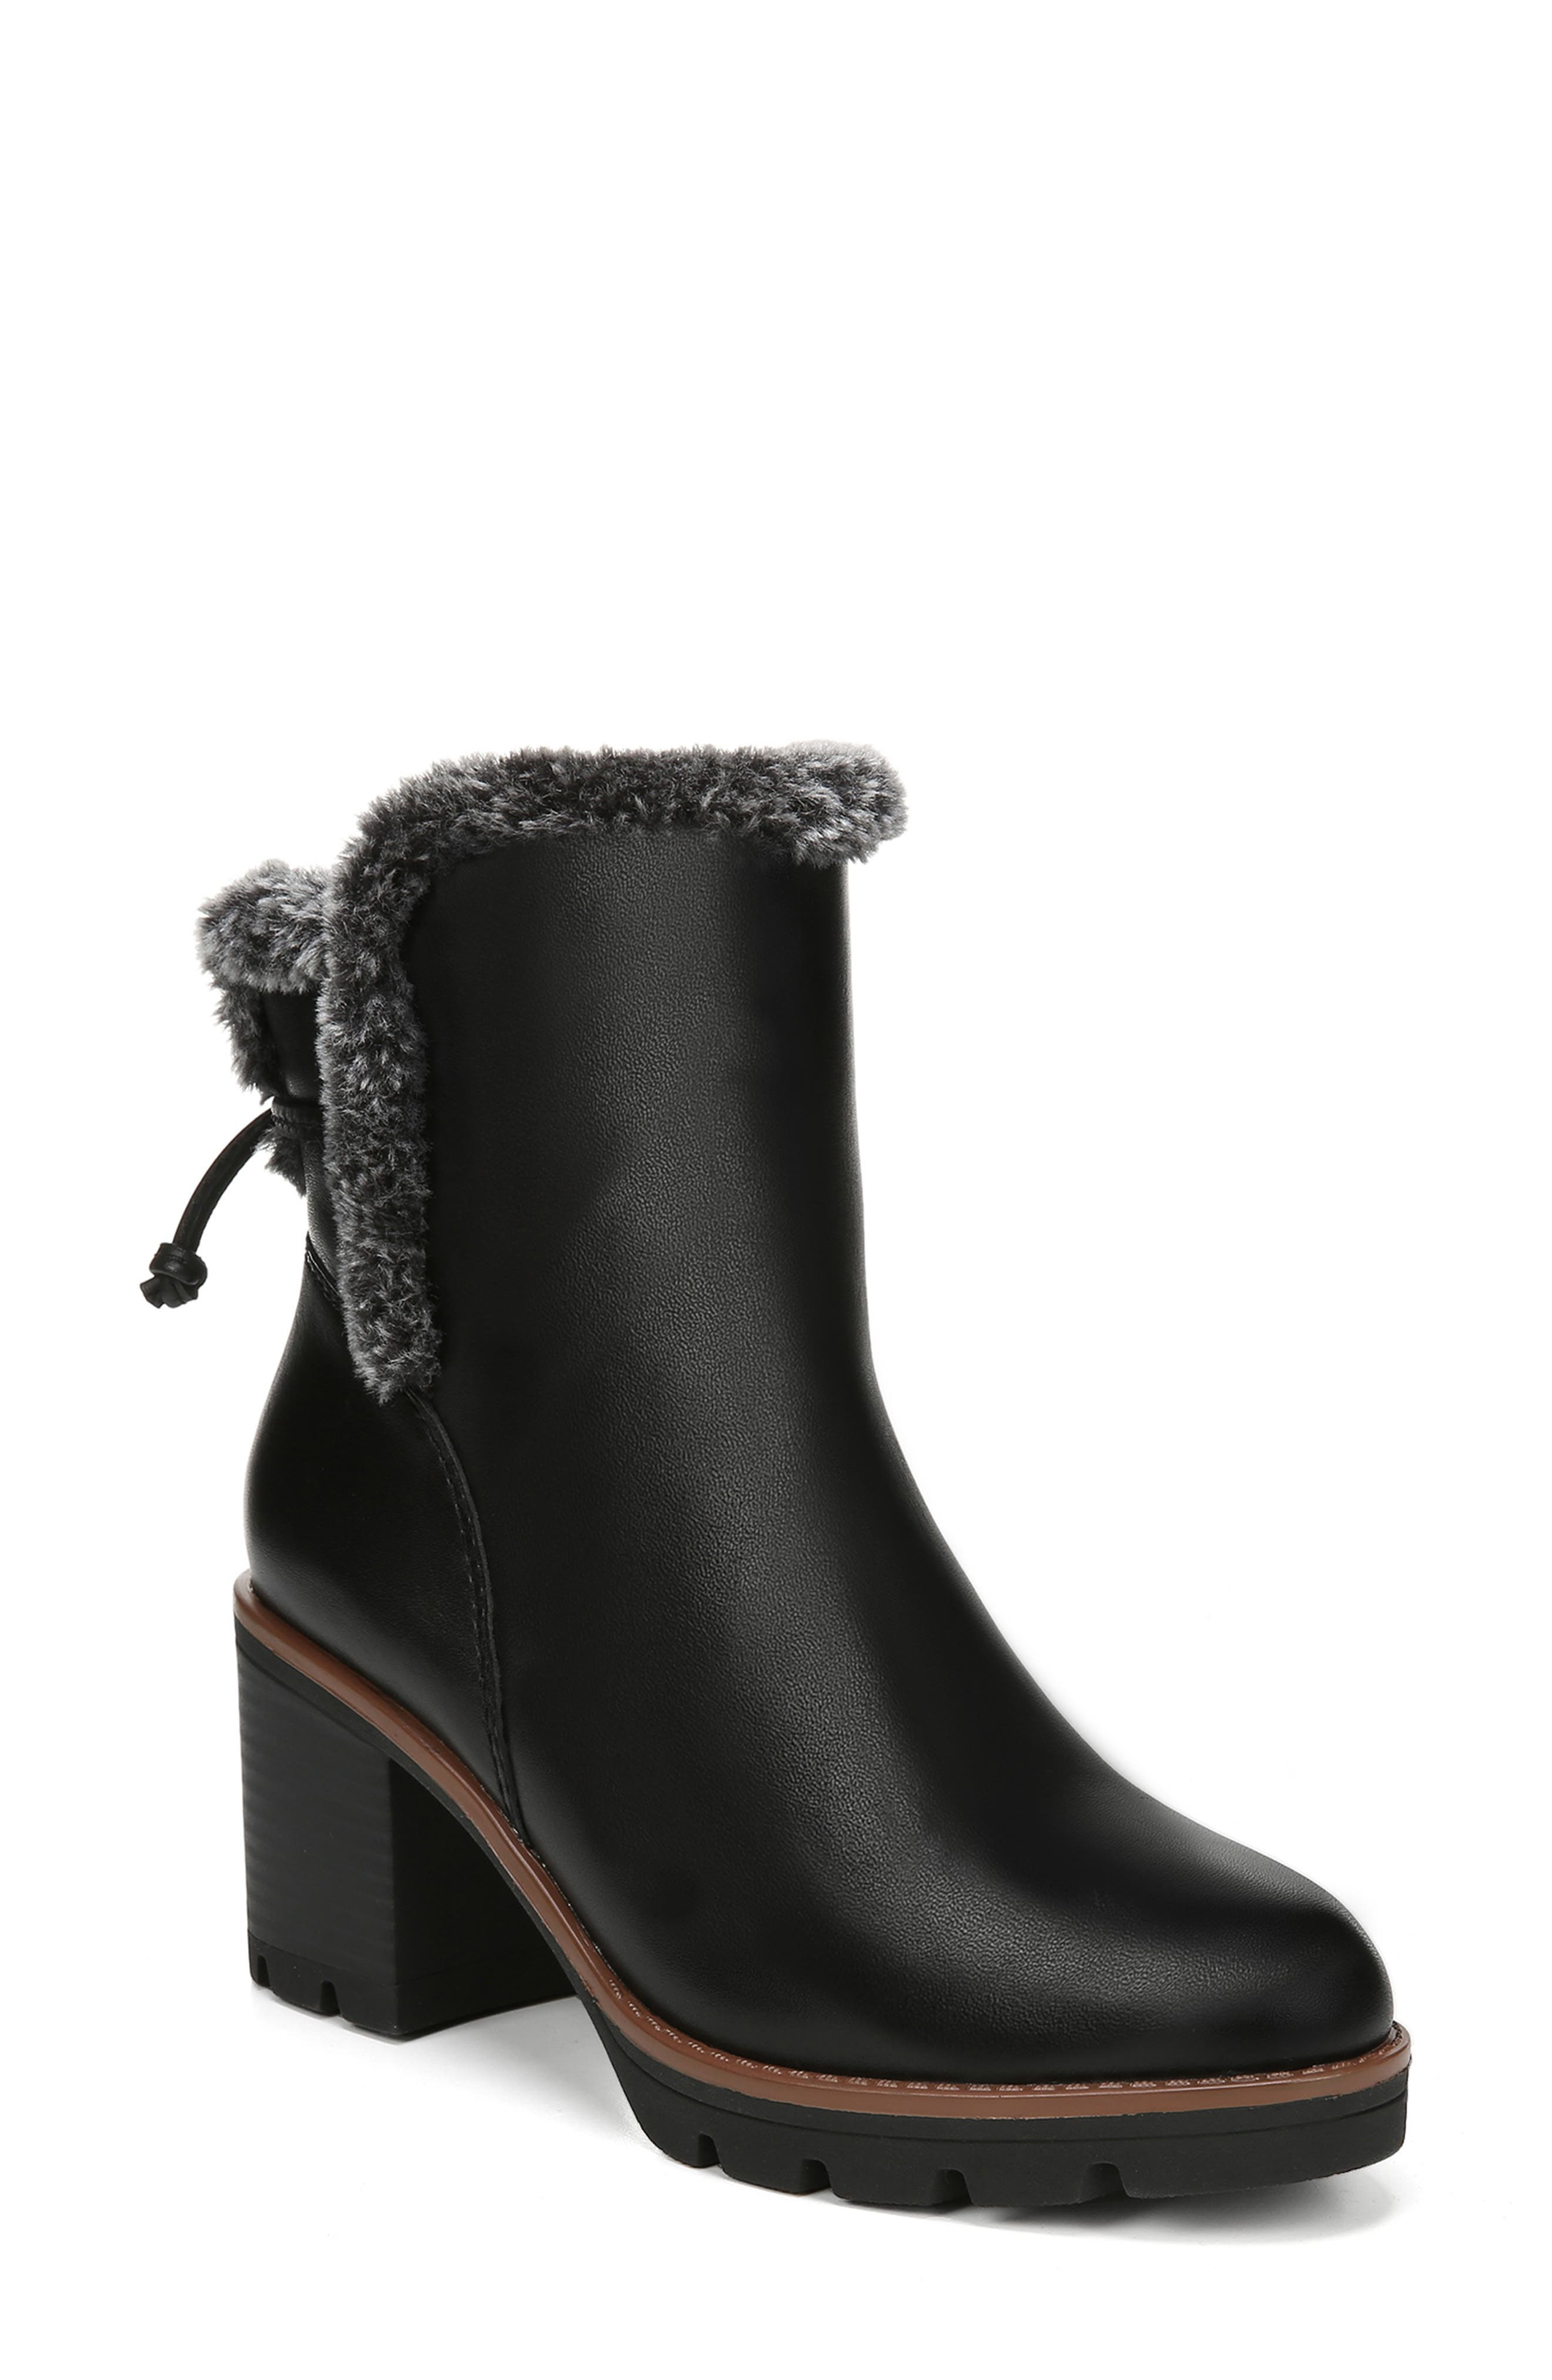 Vintage Boots- Buy Winter Retro Boots Womens Naturalizer Valene Waterproof Bootie Size 8 W - Black $169.95 AT vintagedancer.com